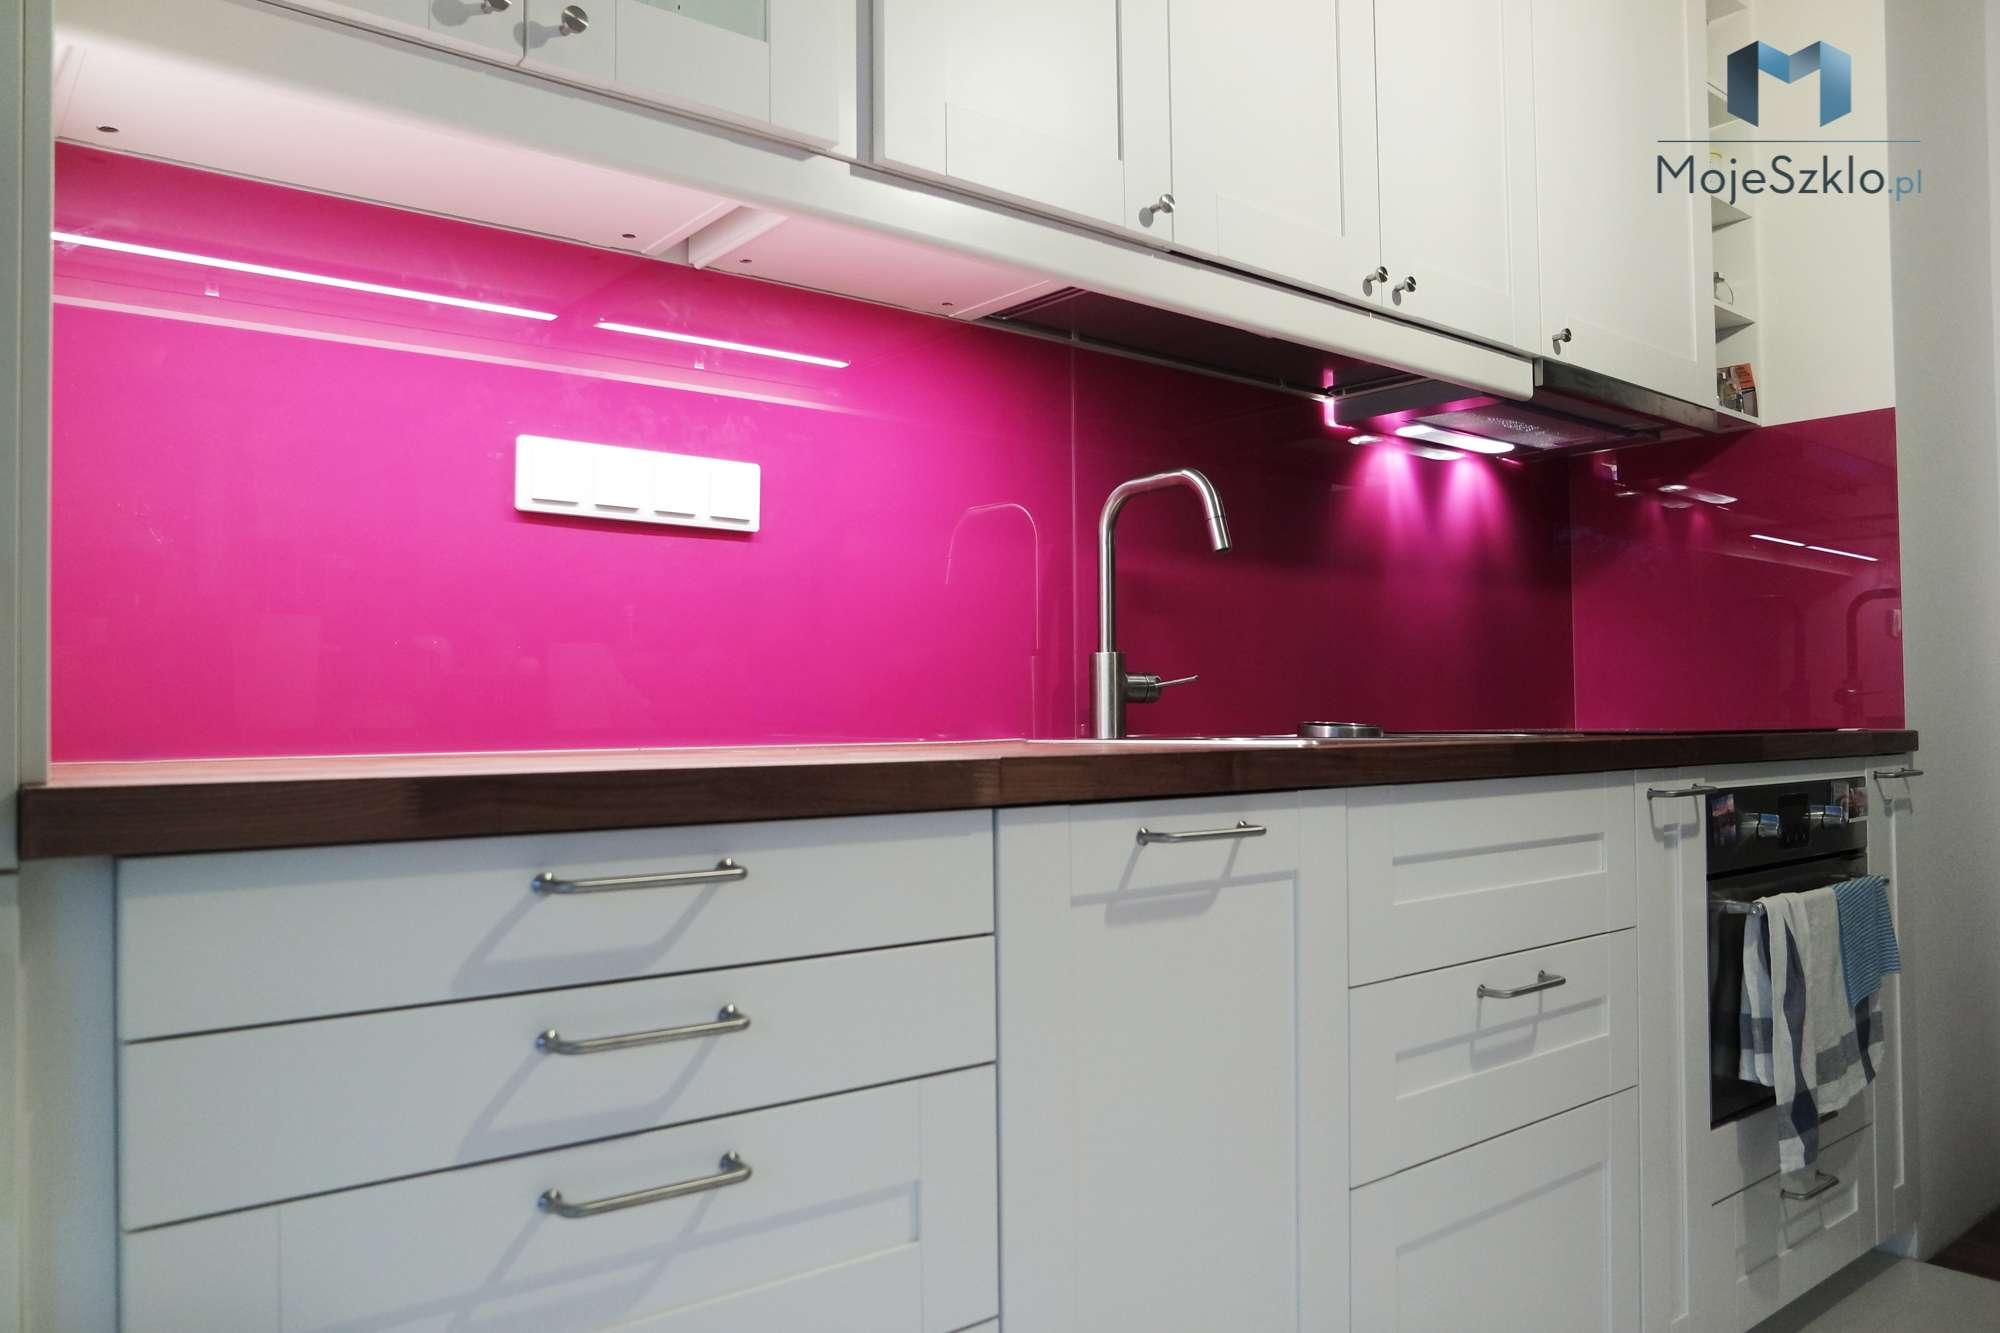 Lacobel Na Wymiar Krakow Fuksja - Lustro w kuchni. Panele lustrzane do kuchni